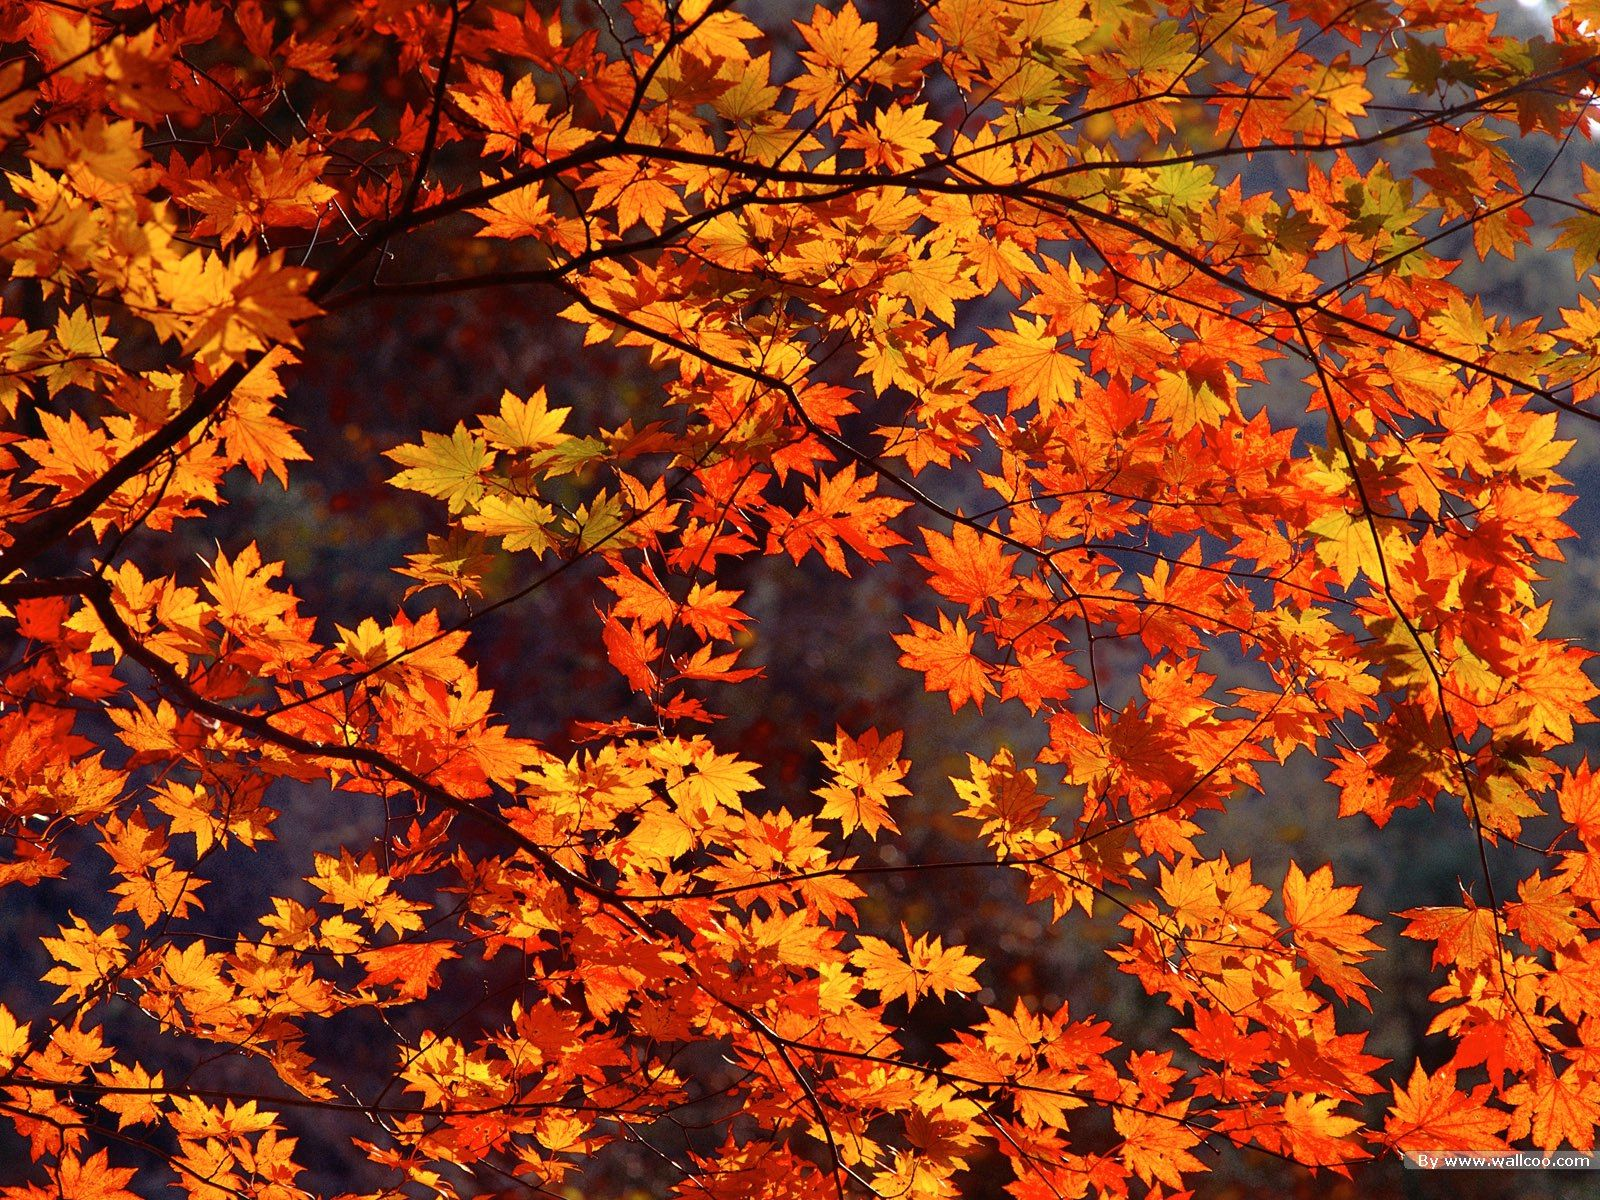 Tumblr Autumn Desktop Wallpapers Top Free Tumblr Autumn Desktop